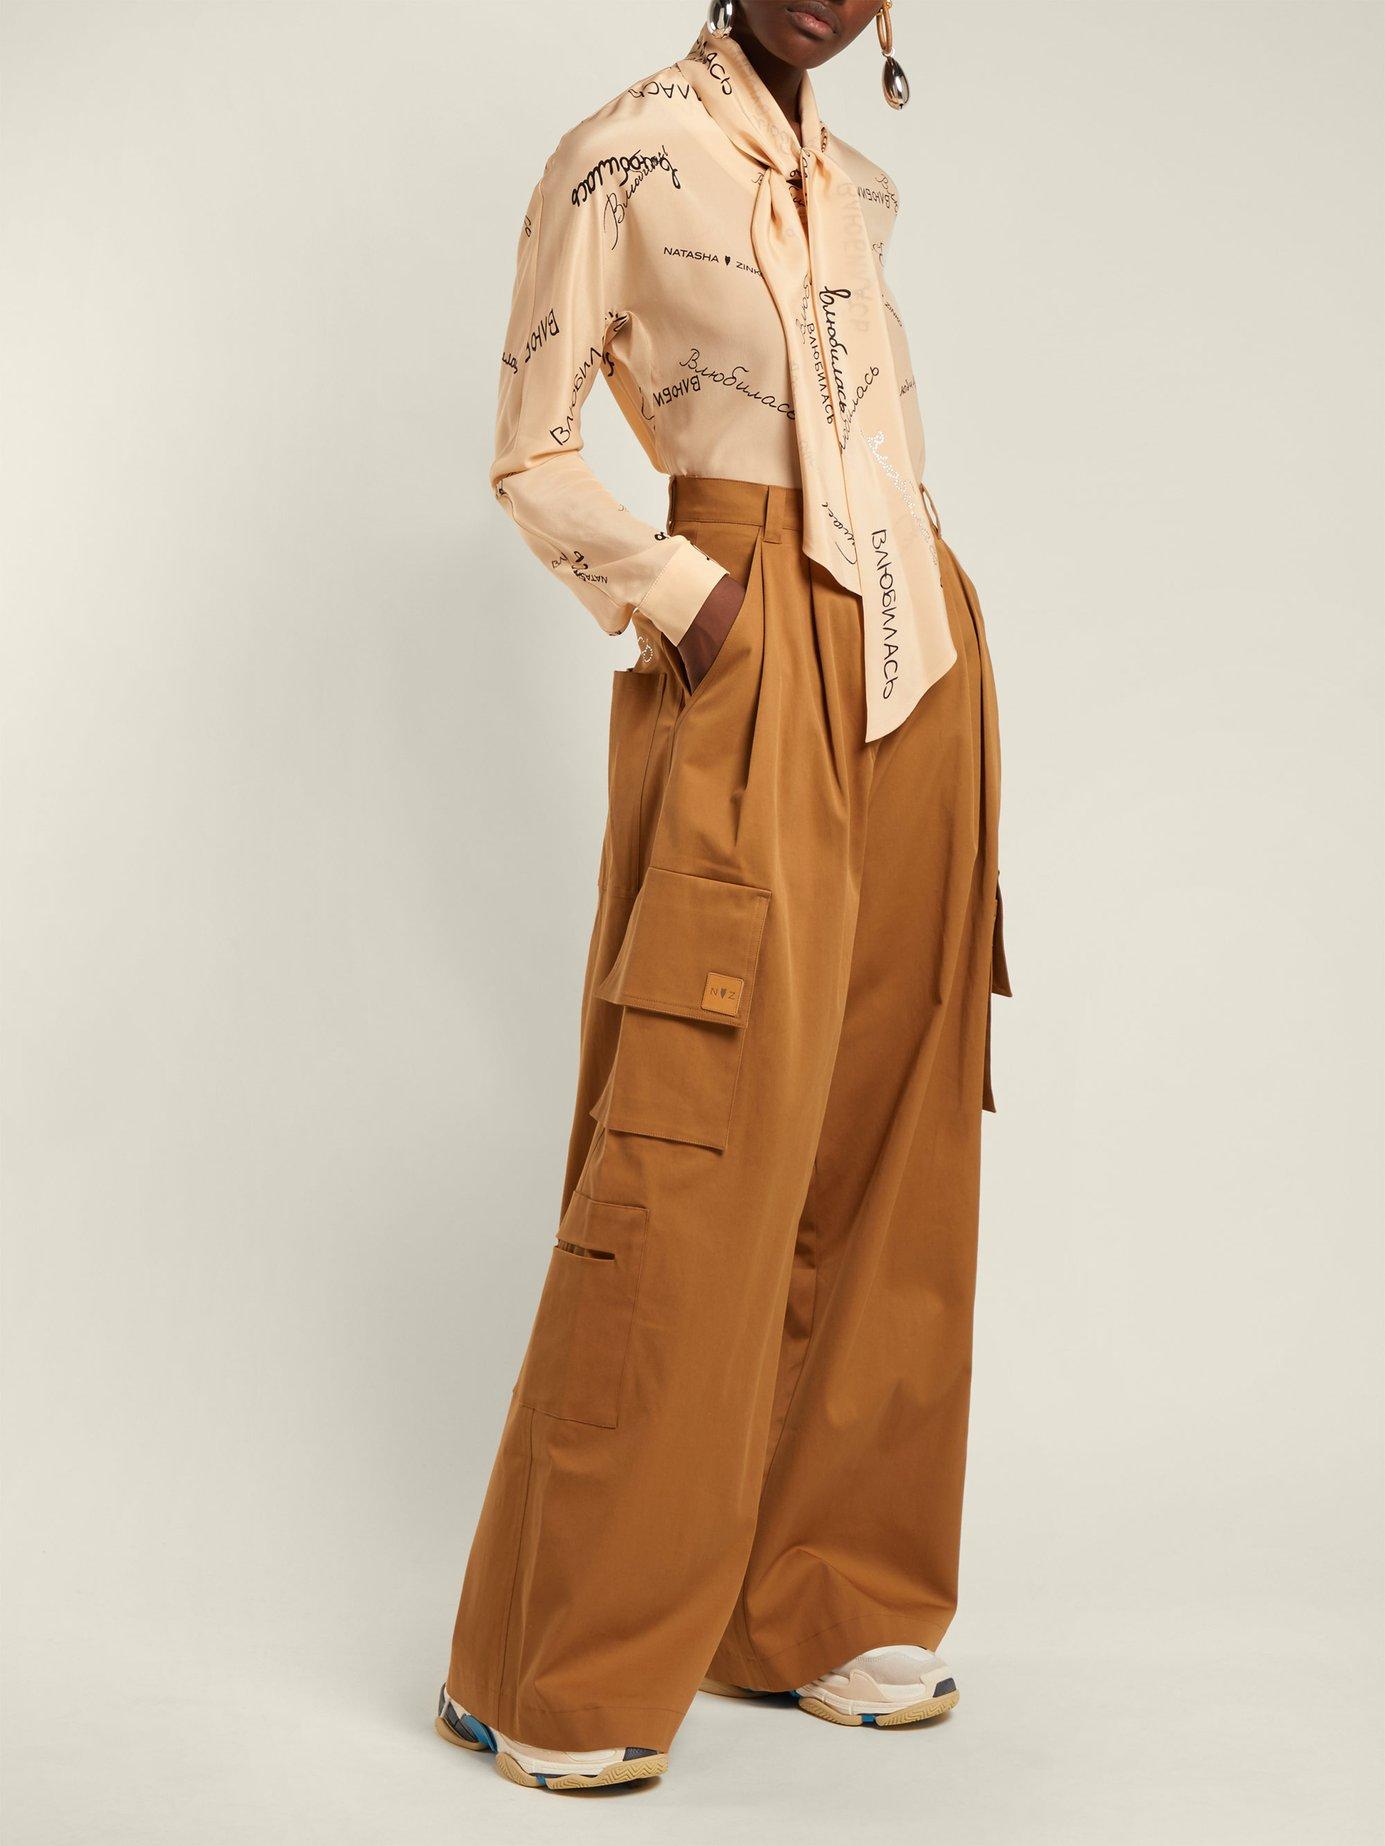 Pussy-bow silk-georgette blouse by Natasha Zinko